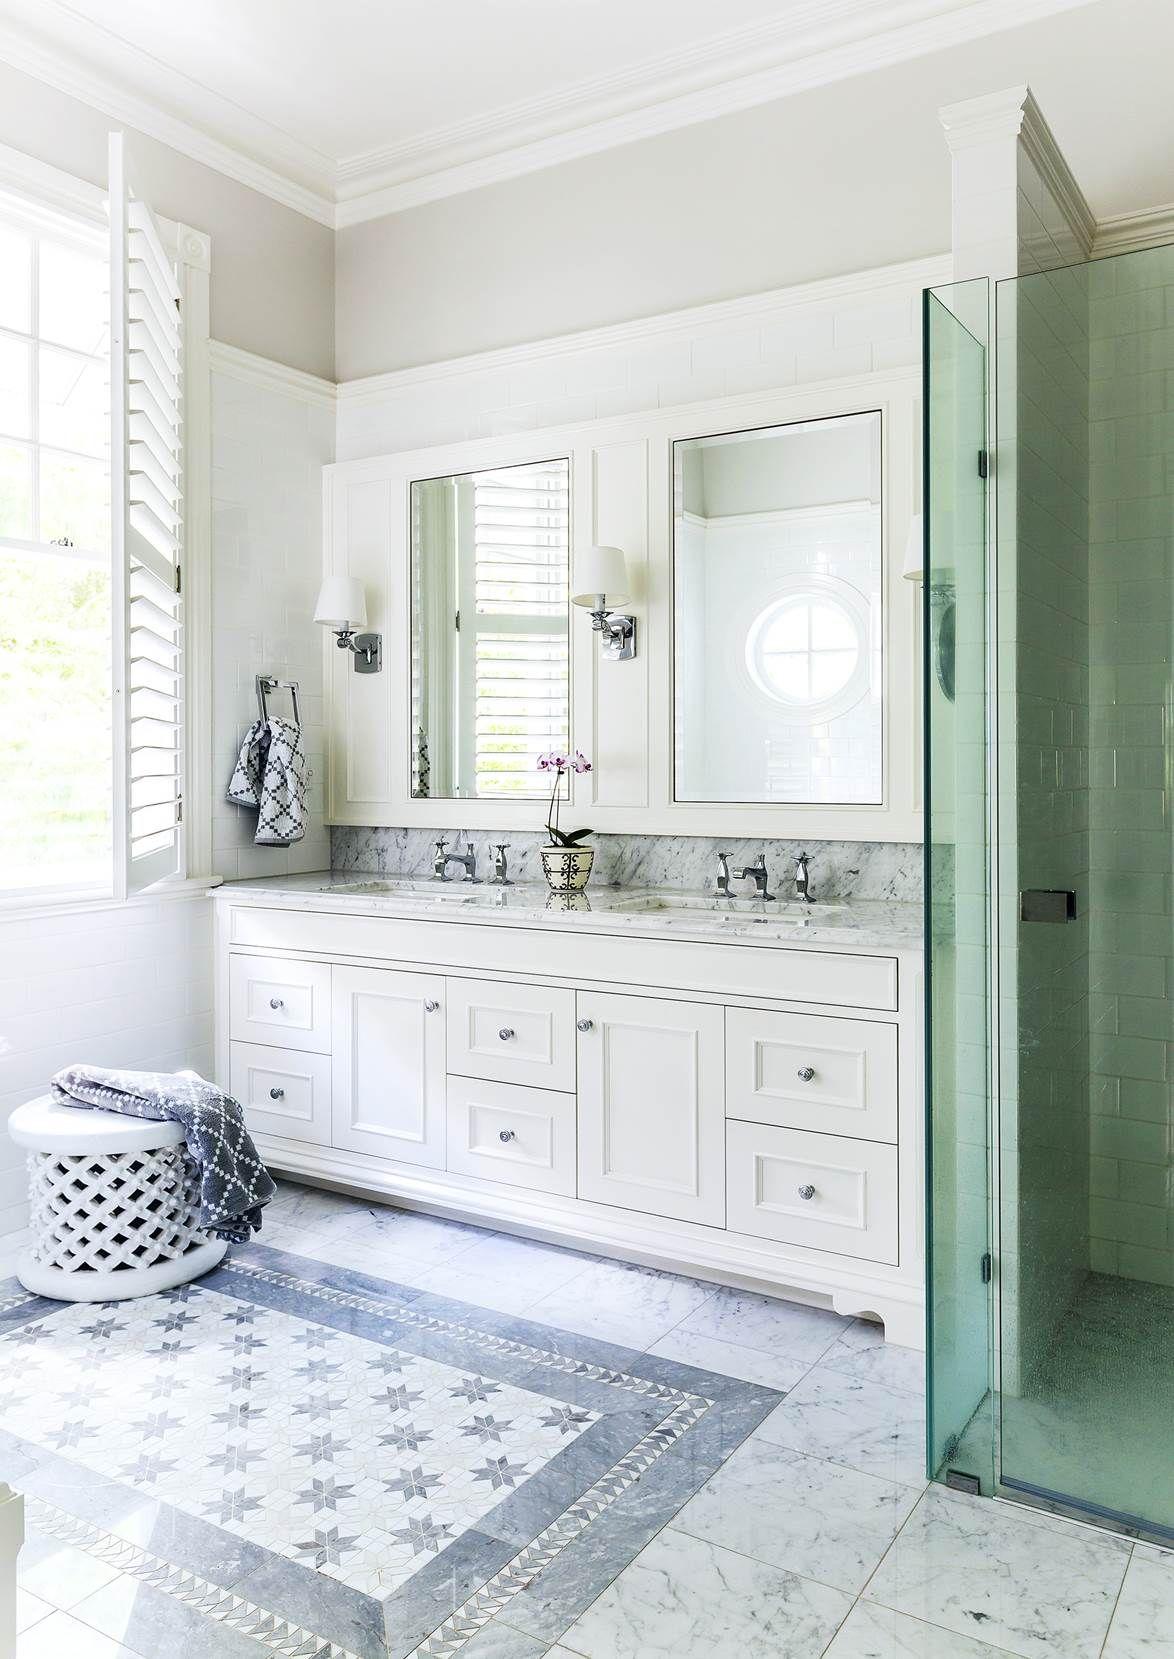 Queenslander Bathroom Ideas - Room Pictures & All About ...